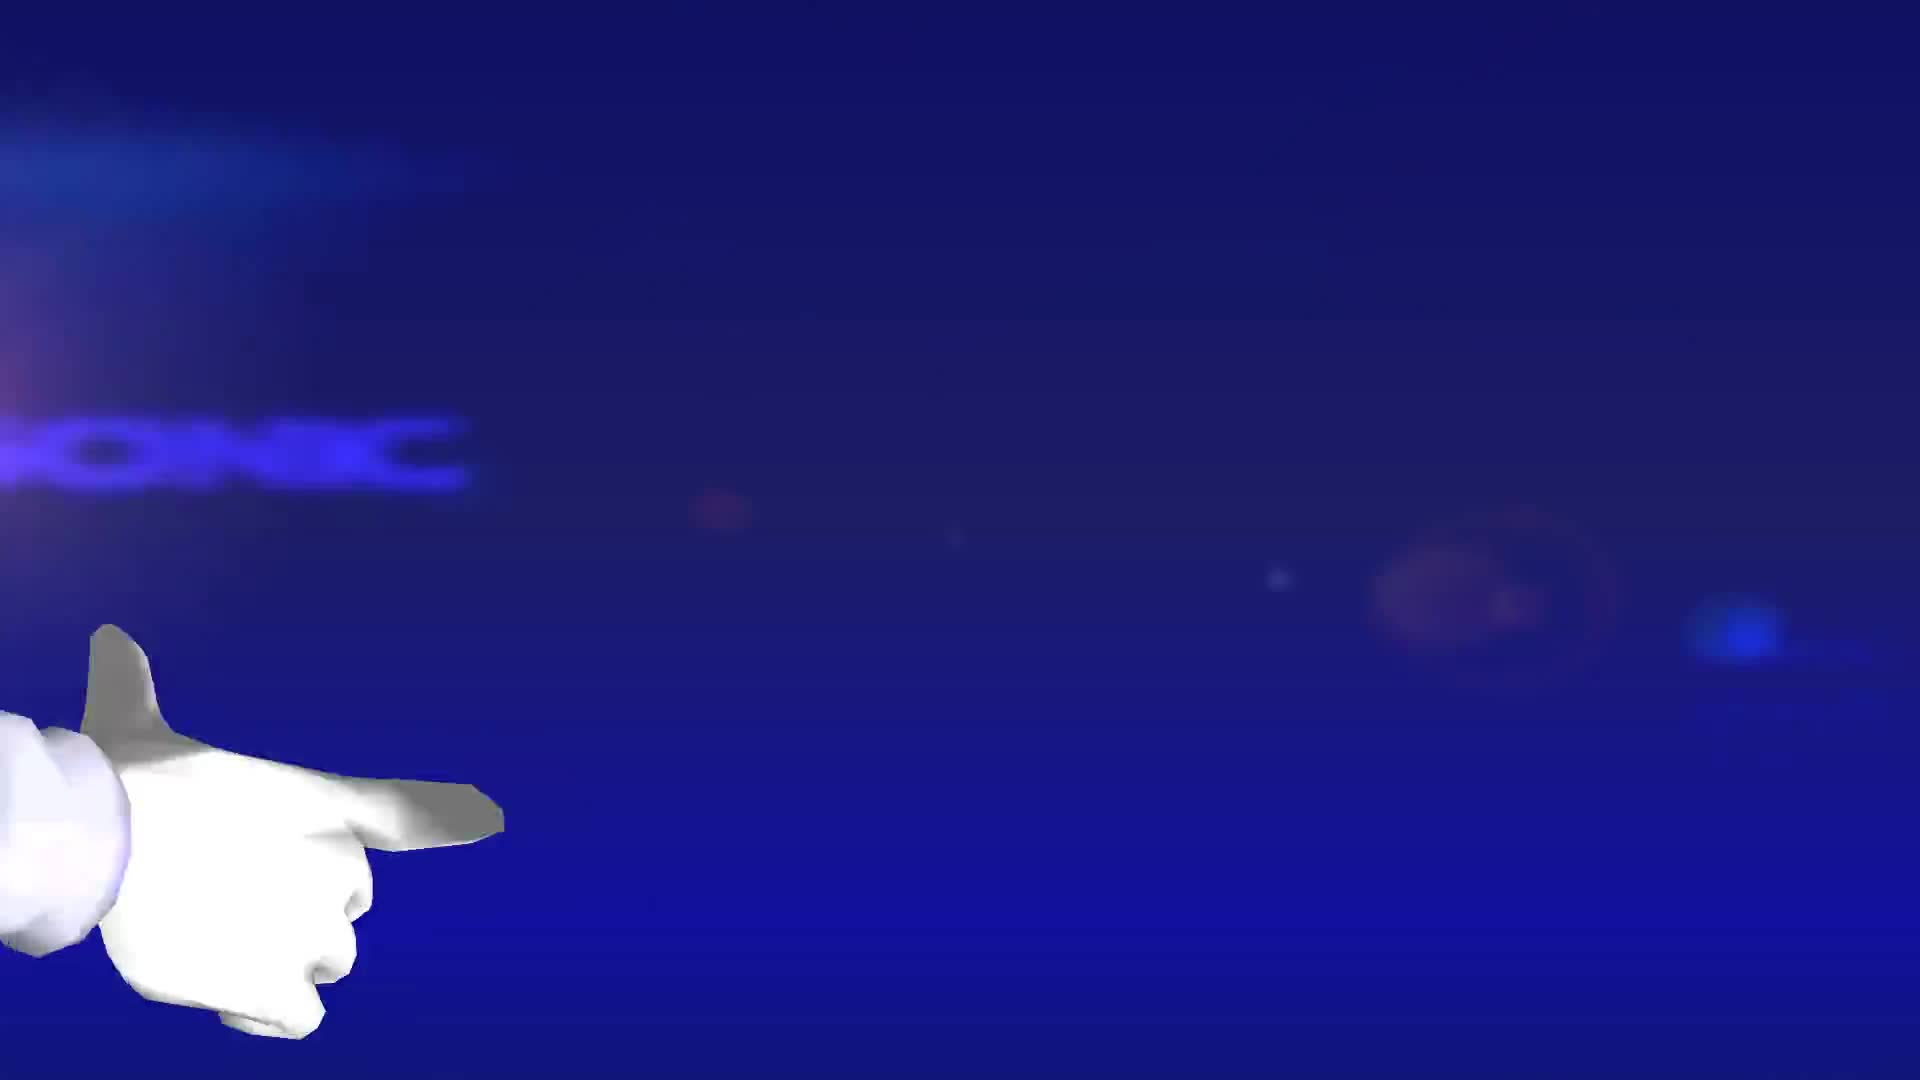 ▷ Sonic Adventure 2 Battle HD All Bosses GIF by srufus3d